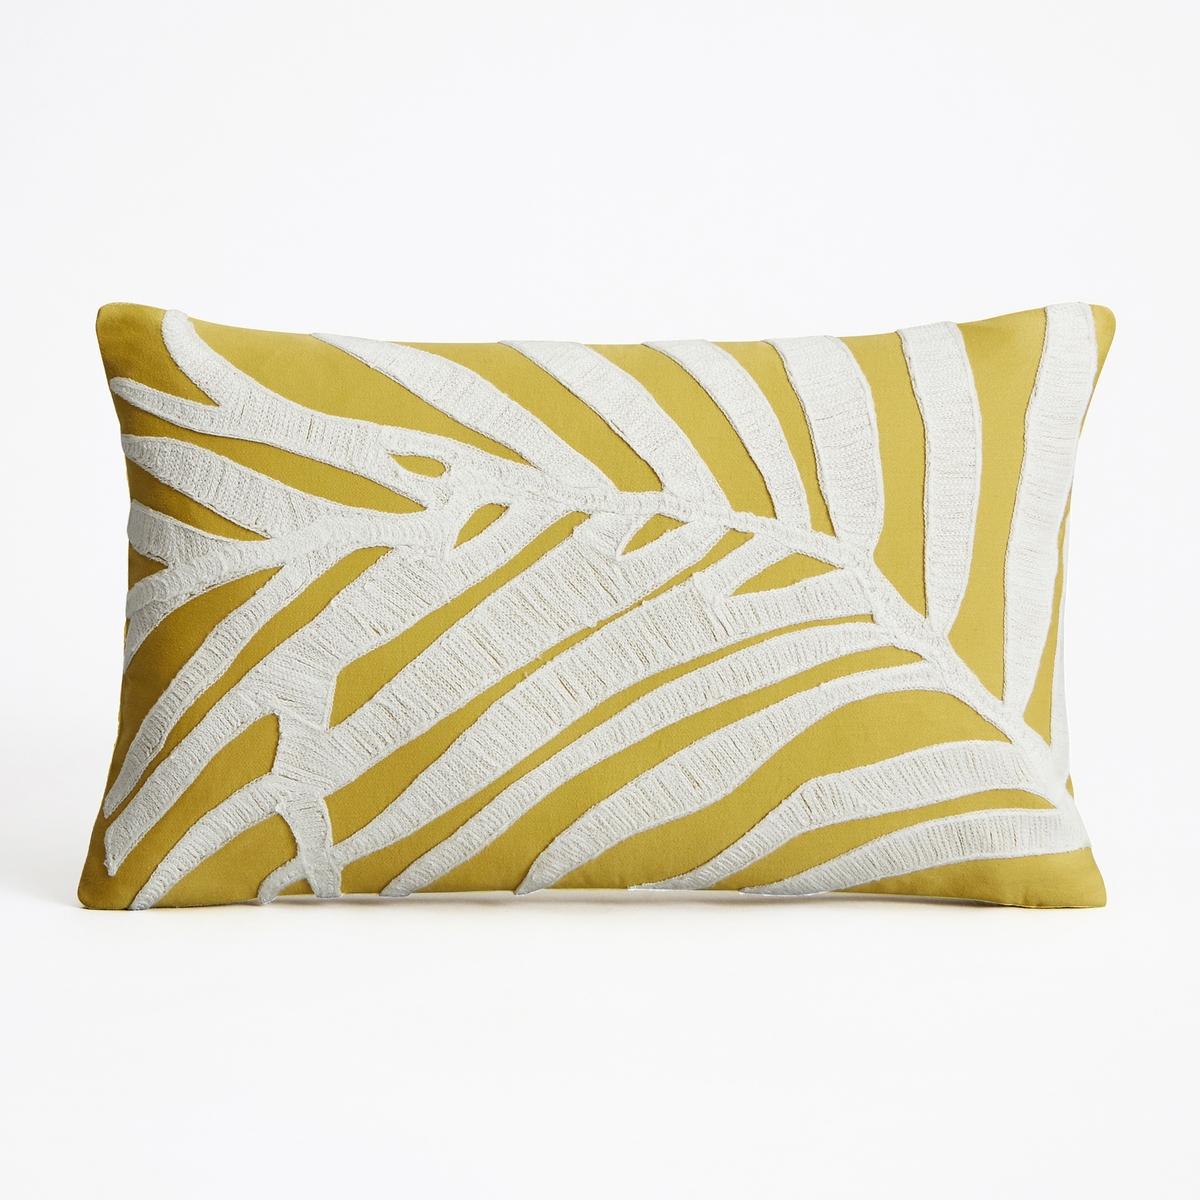 Наволочка на подушку-валик Fougeras<br><br>Цвет: зеленый